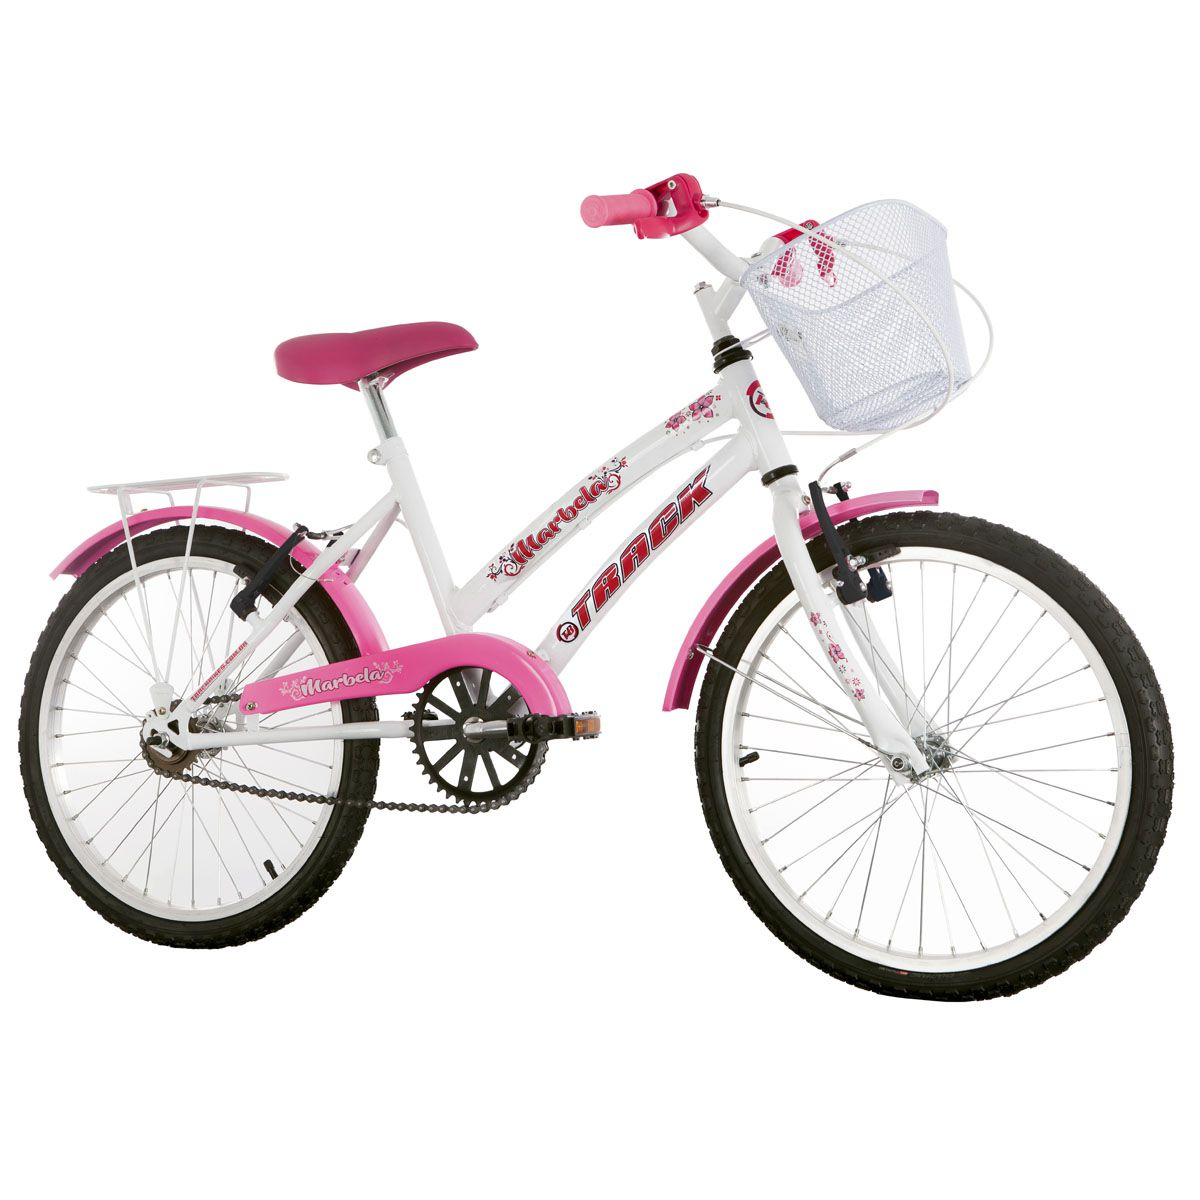 Bicicleta Aro 20 Track Marbela Infanto Juvenil Feminina